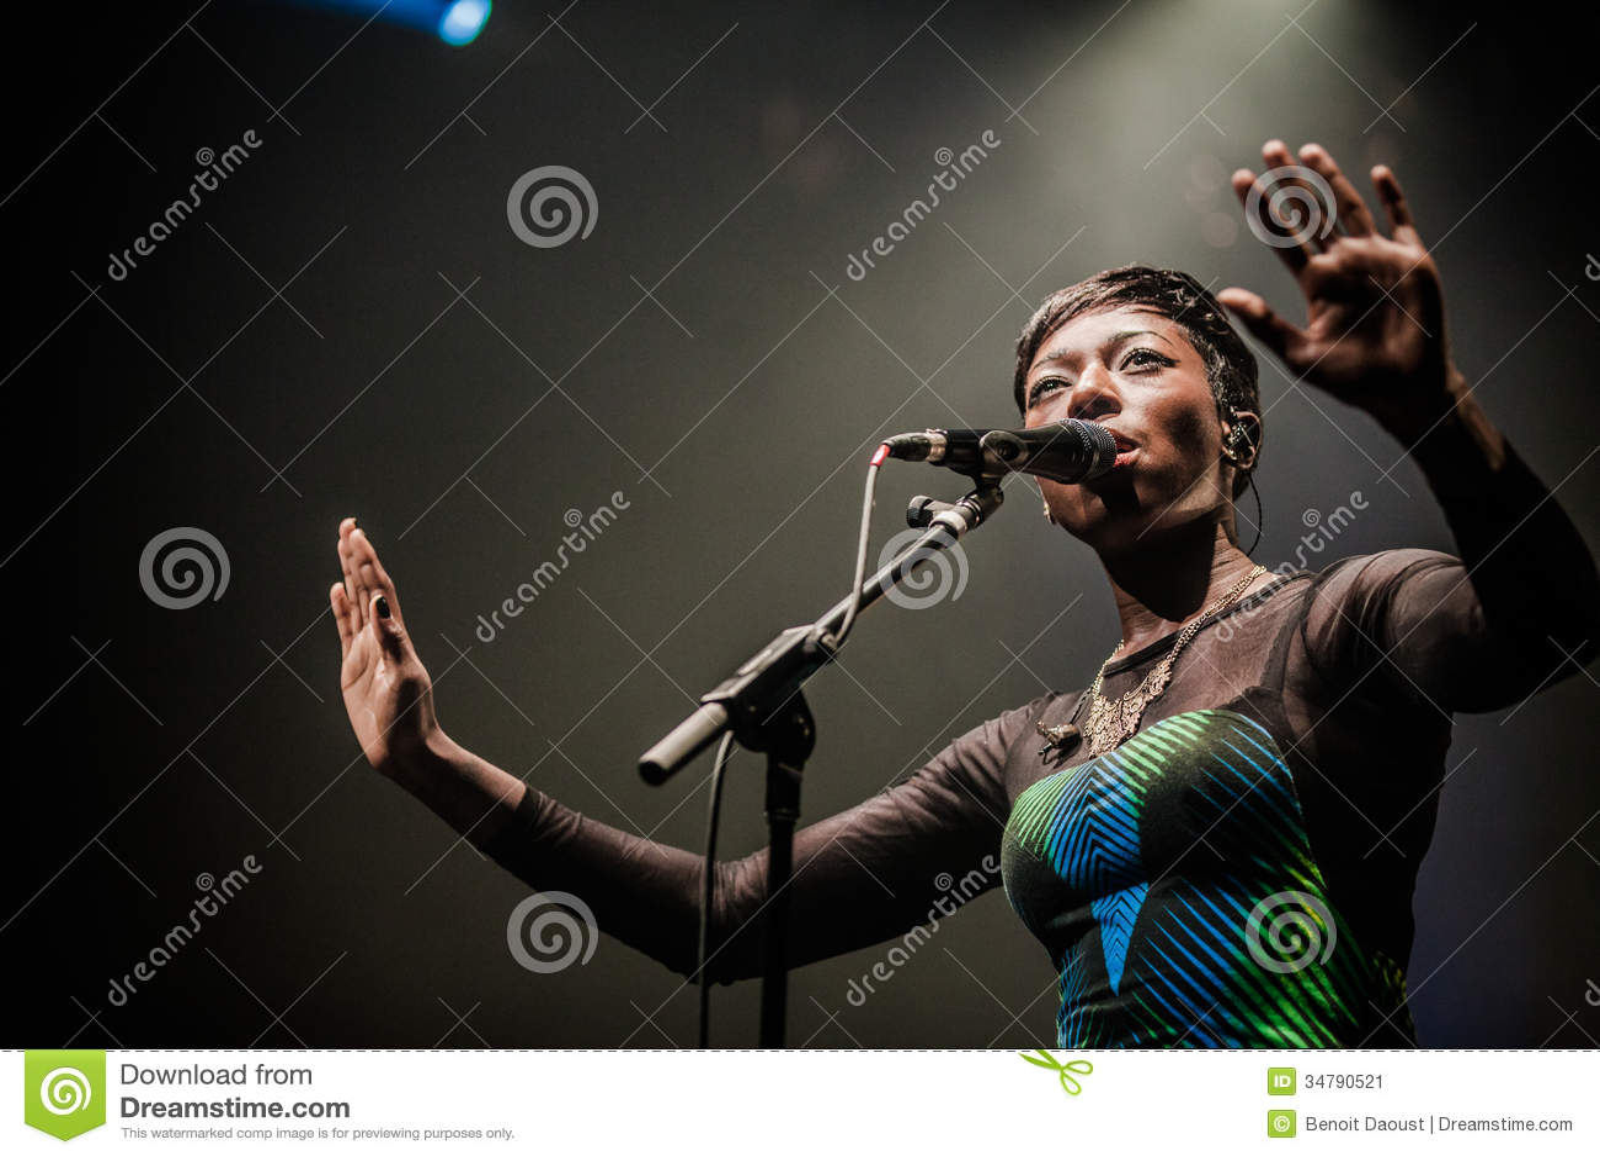 Bonobo στη συναυλία στη μητρόπολη, Μόντρεαλ